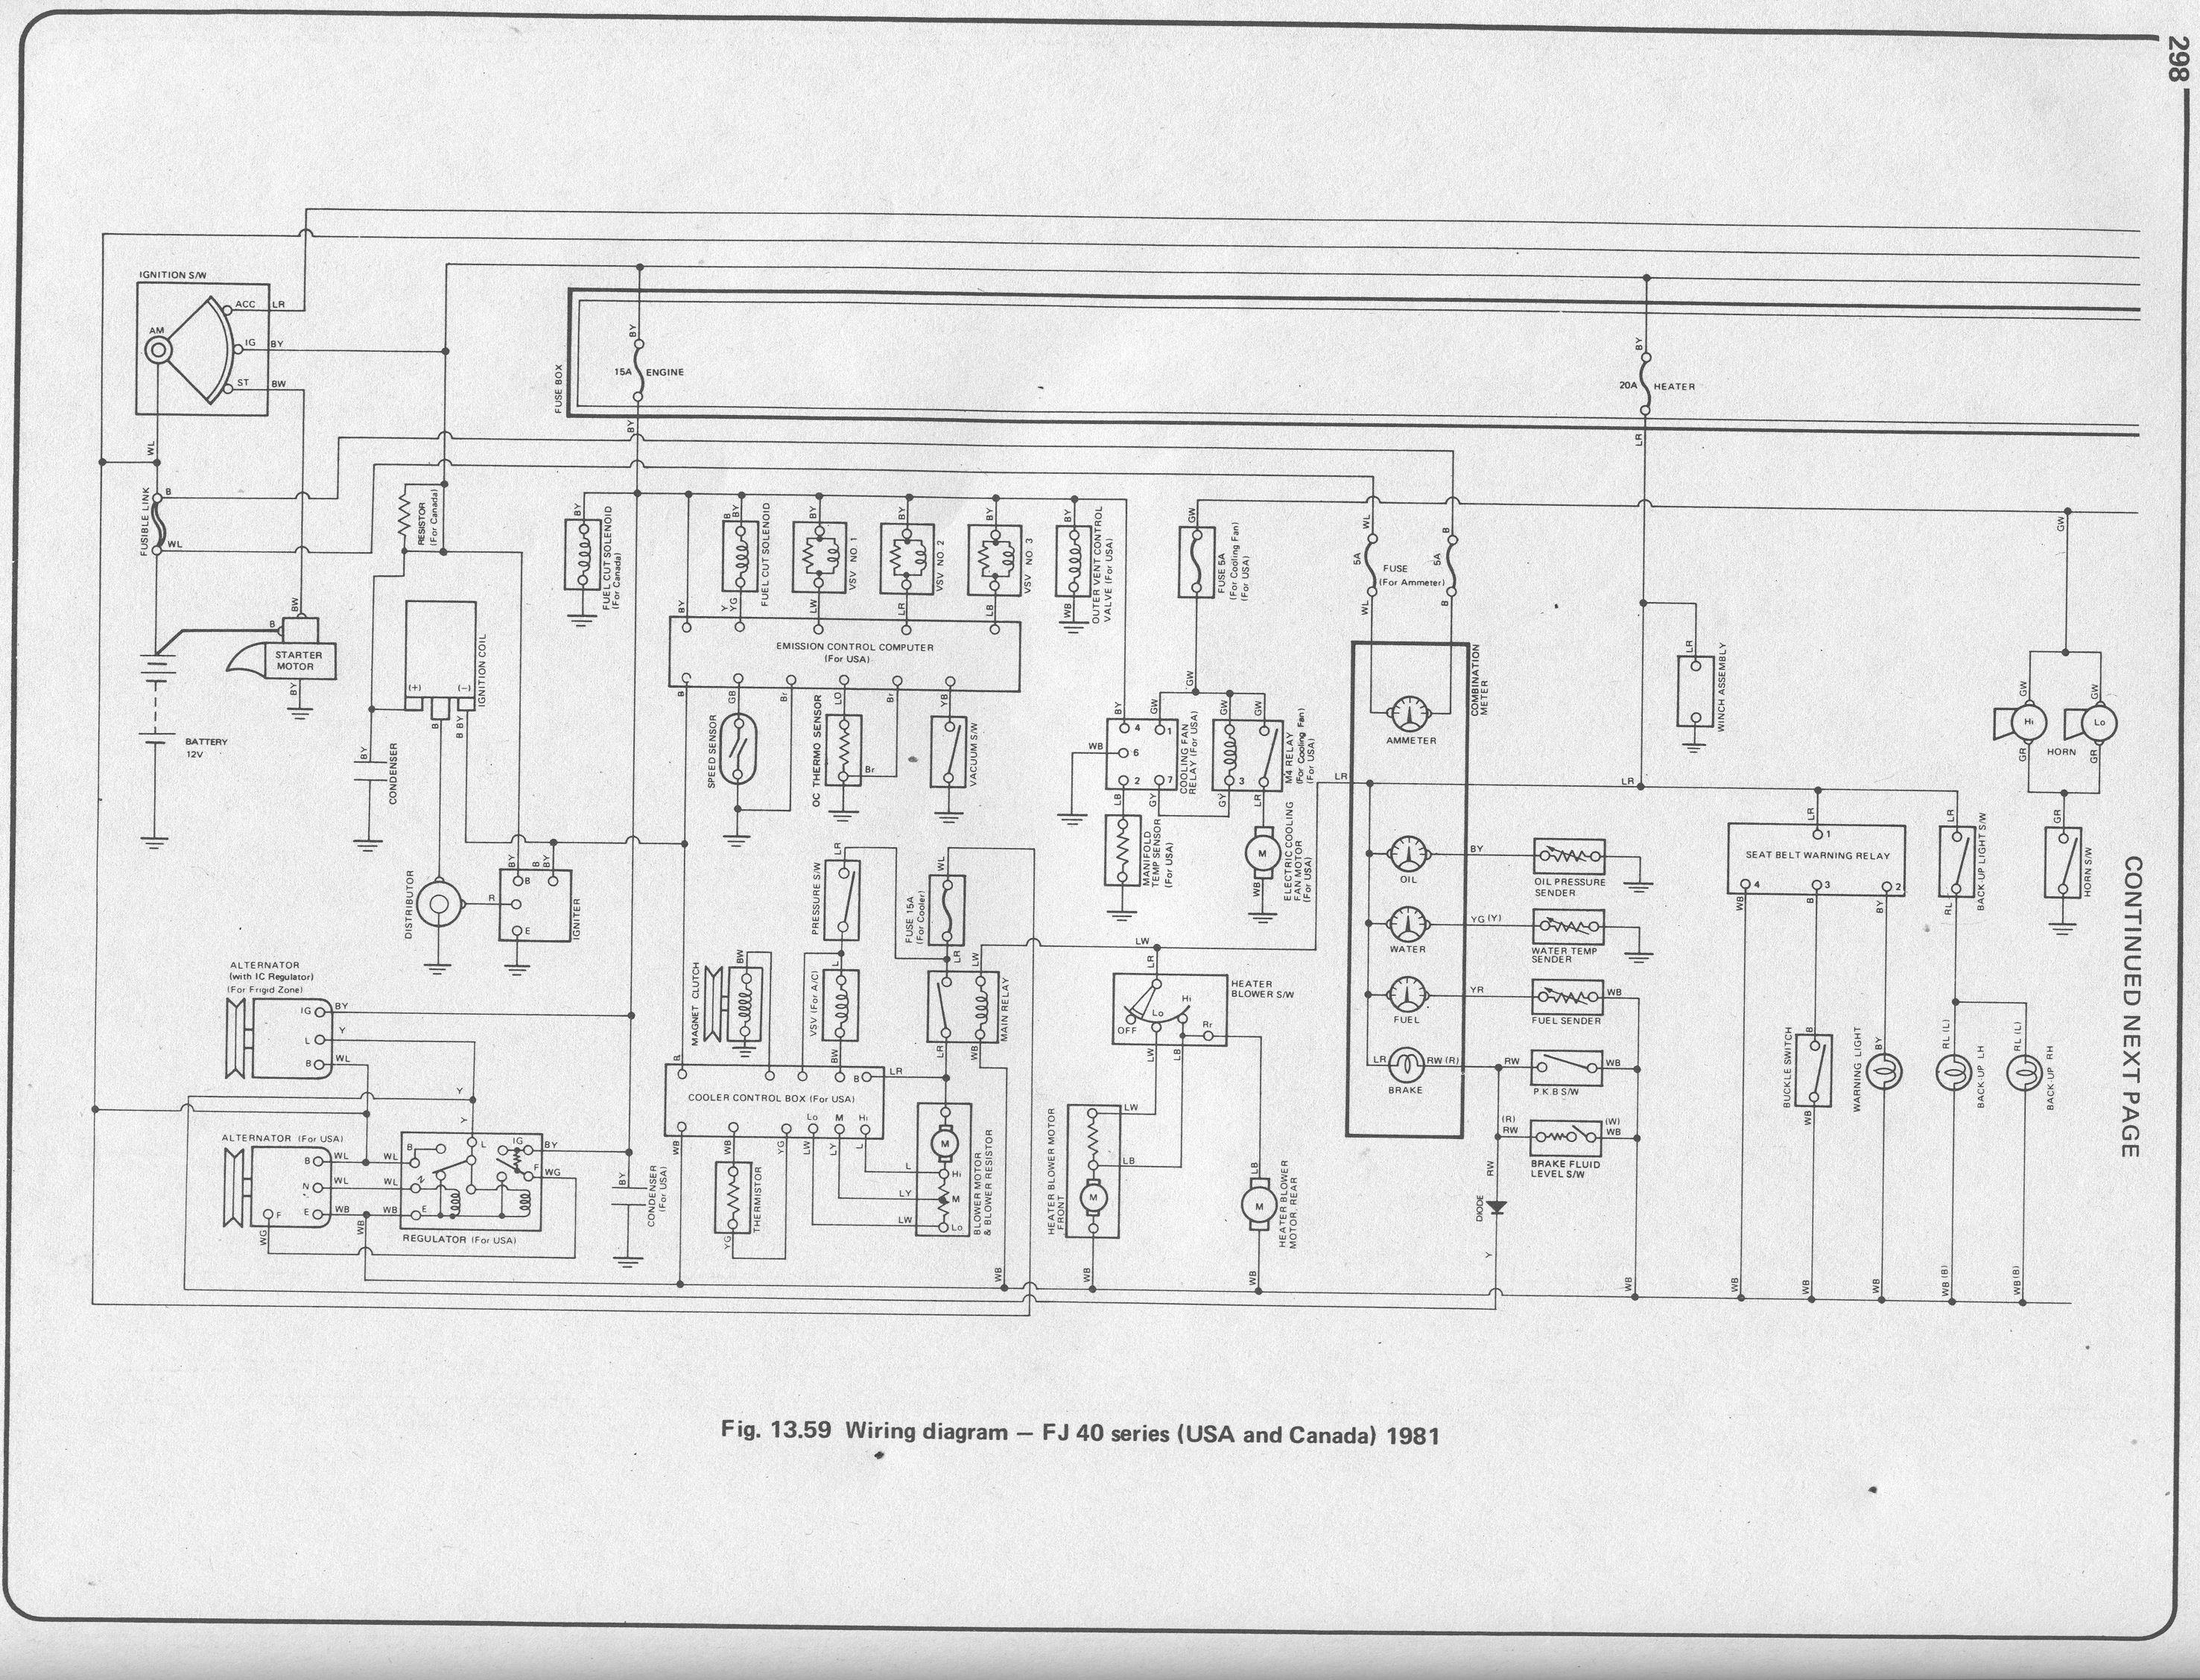 holiday rambler wiring diagrams wiring diagram article Mobile Home Intertherm Furnace Wiring Diagram